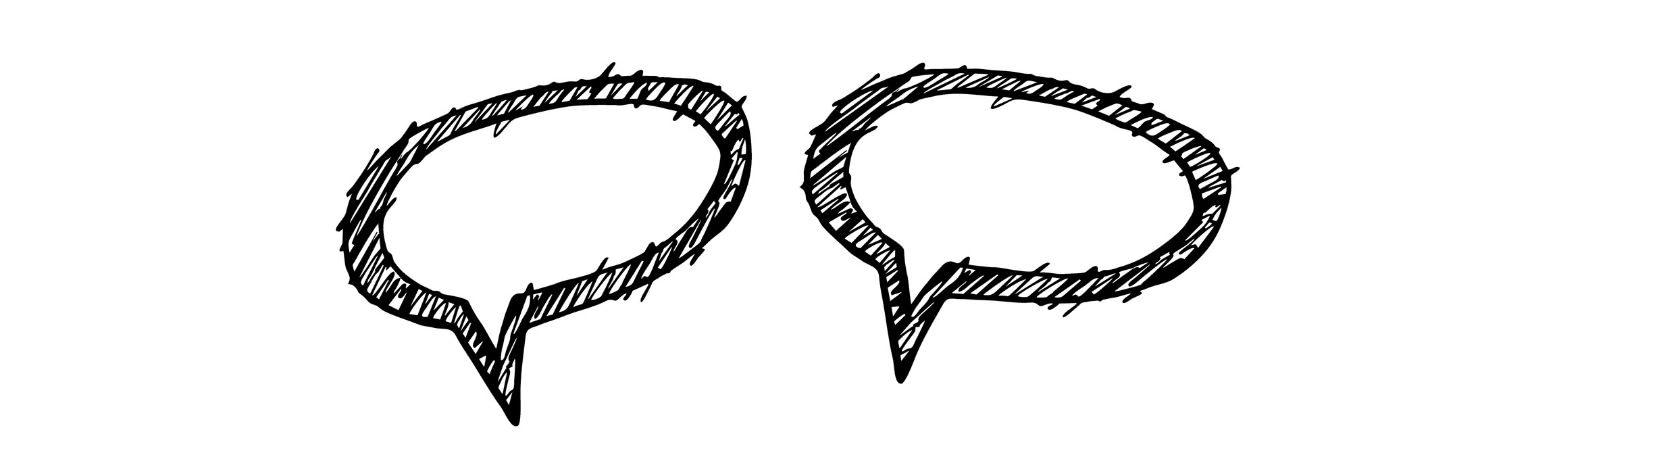 Vds training consultancy blog impactvolle dialoog